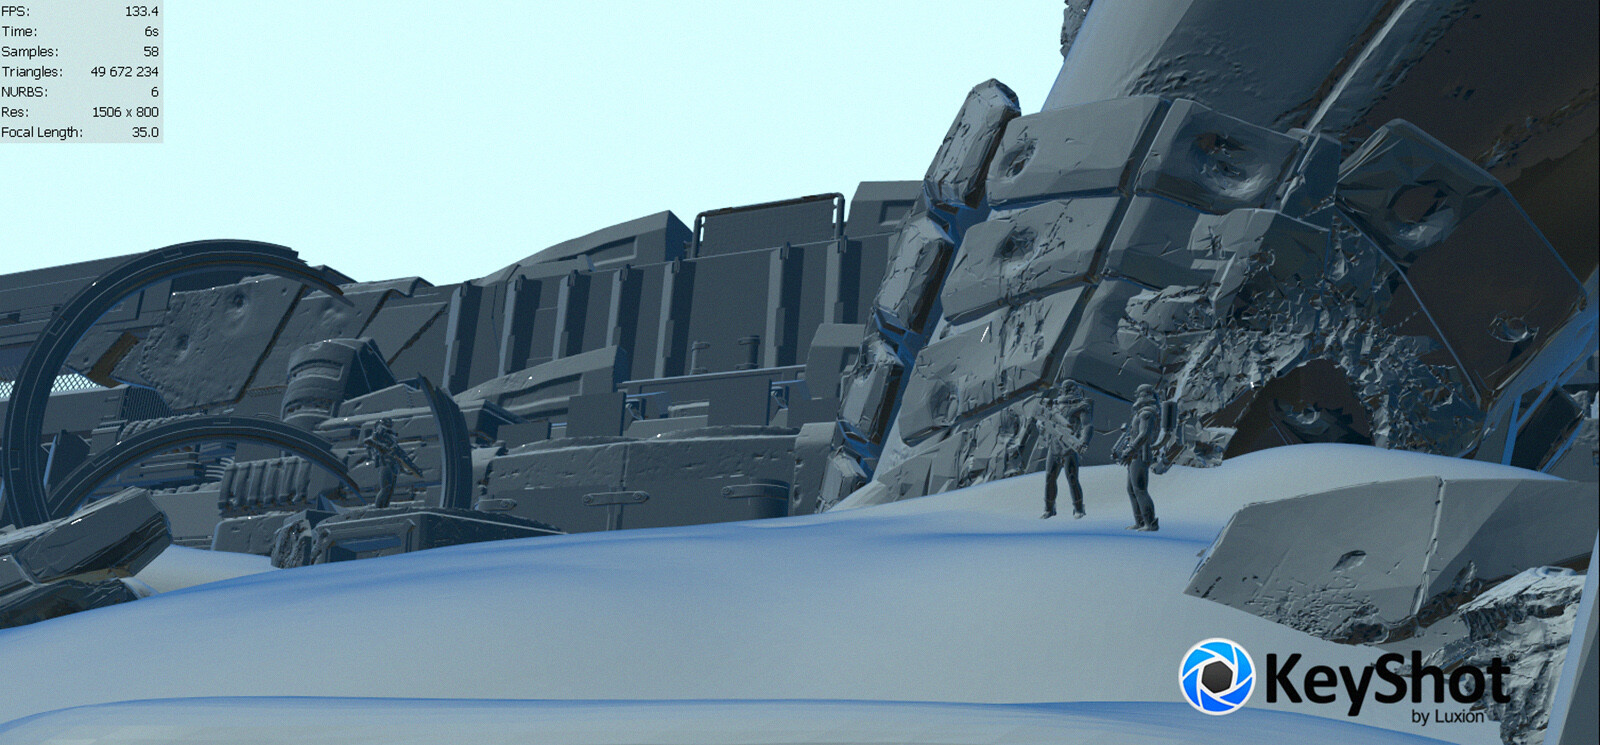 Base scene in Keyshot. Keyshot is an incredible program for concept artists.We are waiting for new release Keyshot 9.